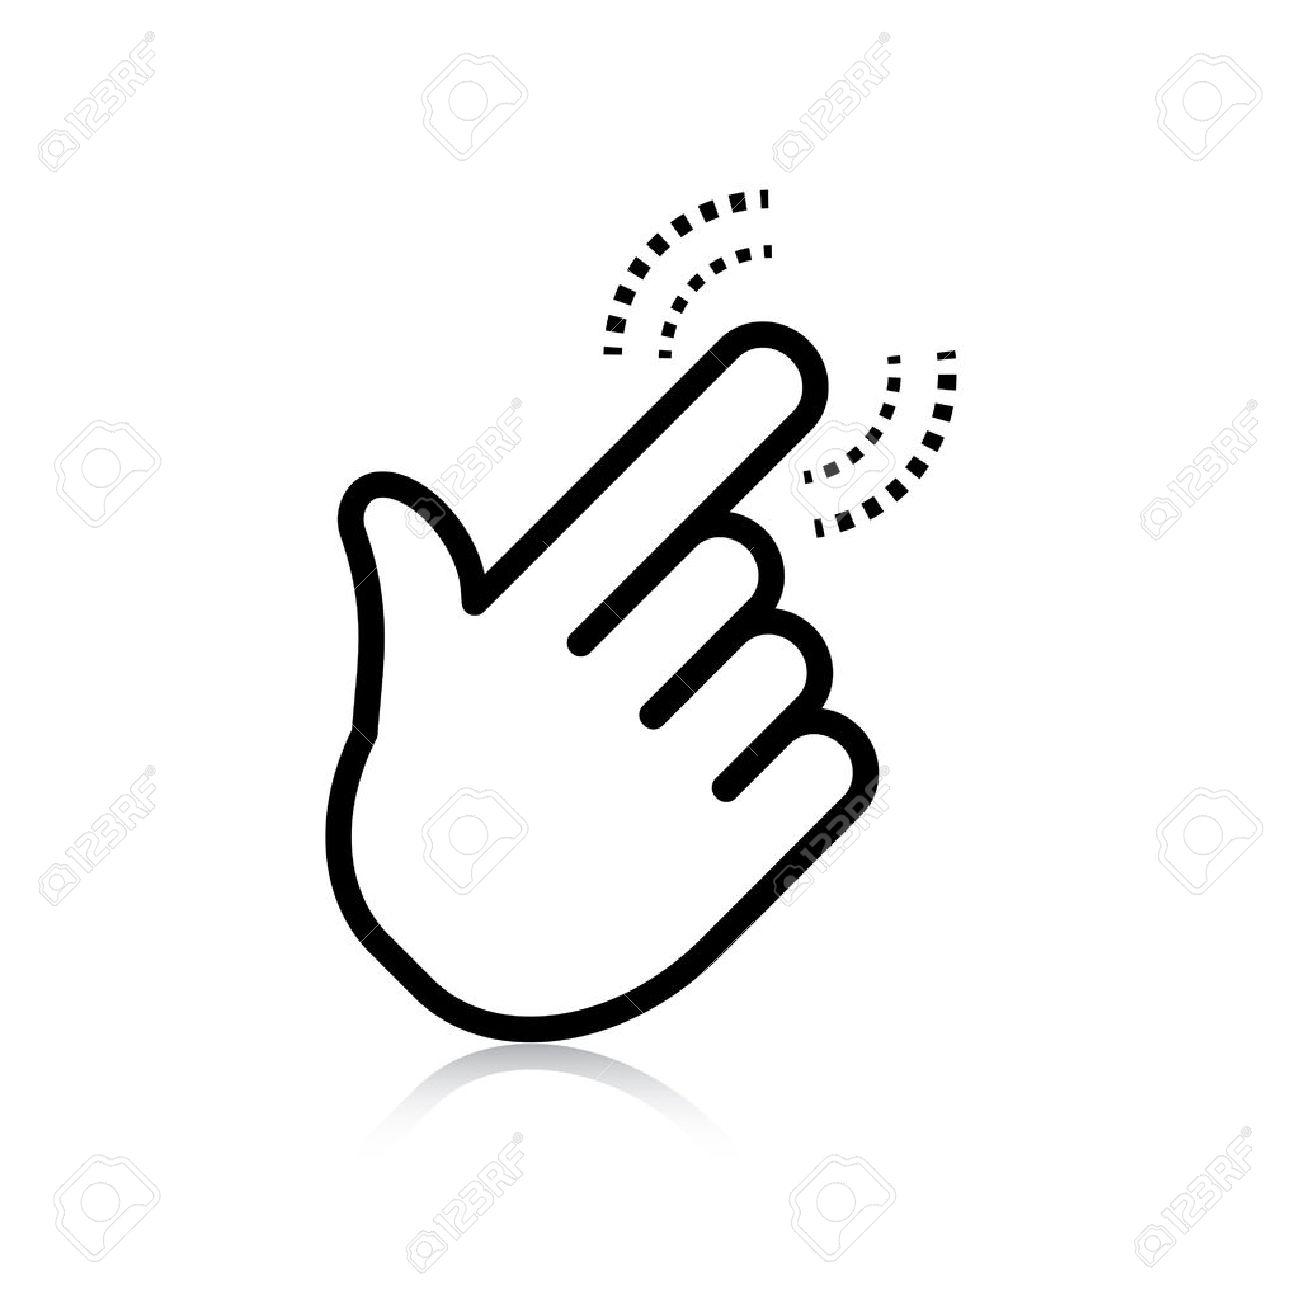 click. hand icon pointer. vector eps8 - 22951731